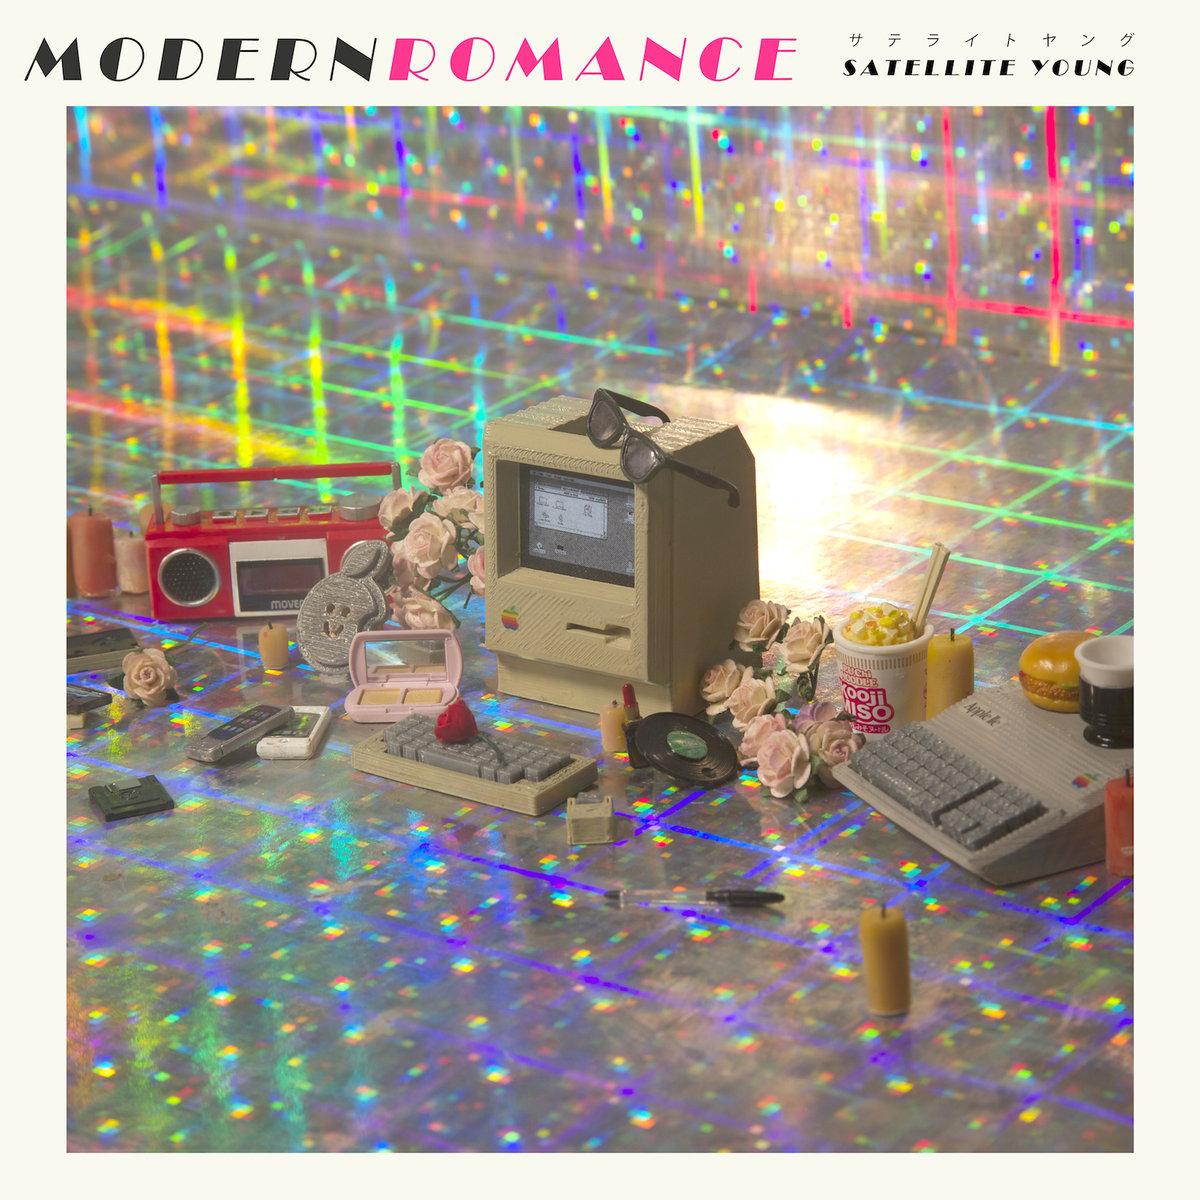 satellite-young-modern-romance